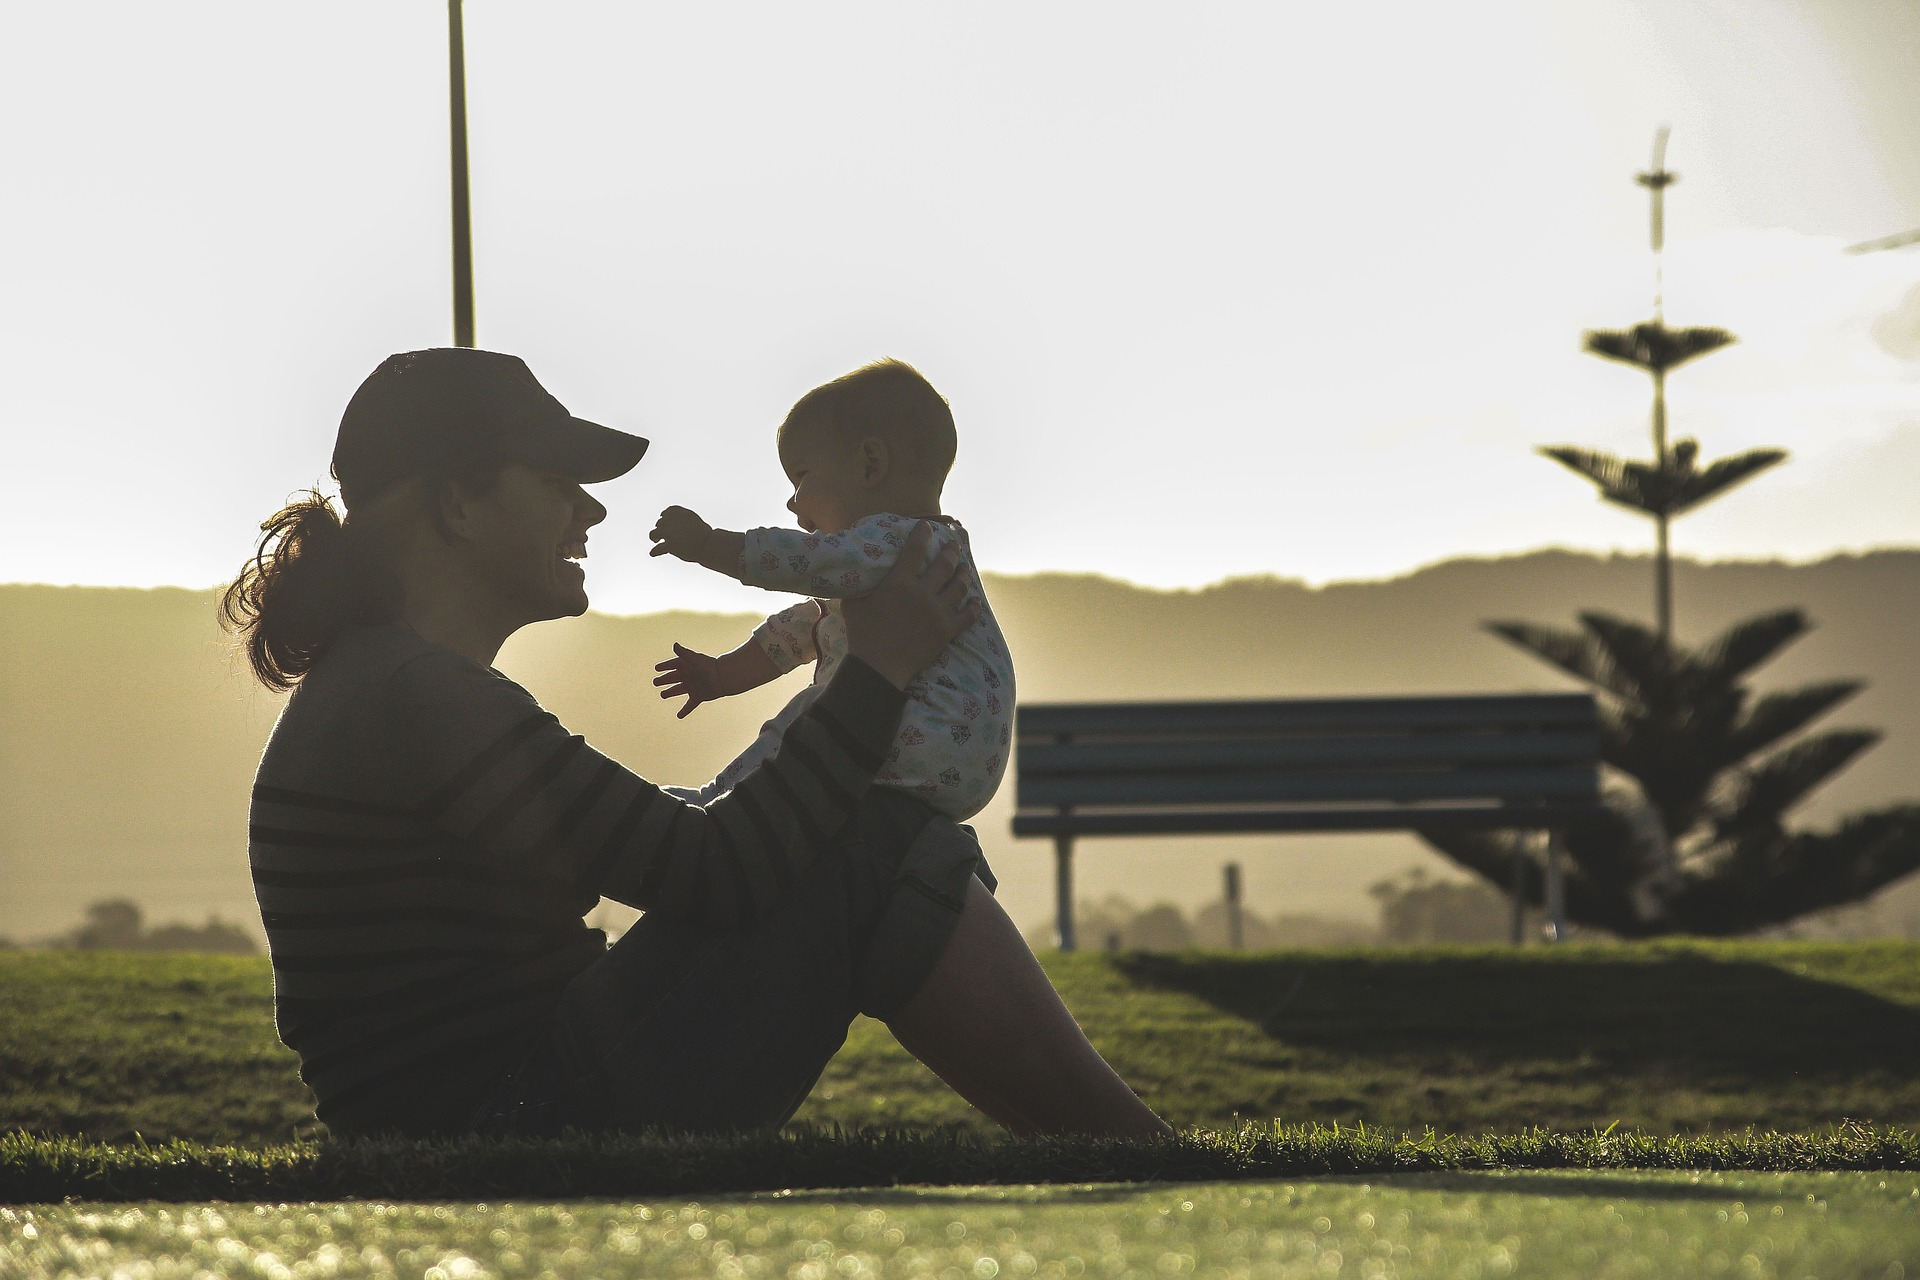 Komm in Bewegung!  Fitness mit Kind